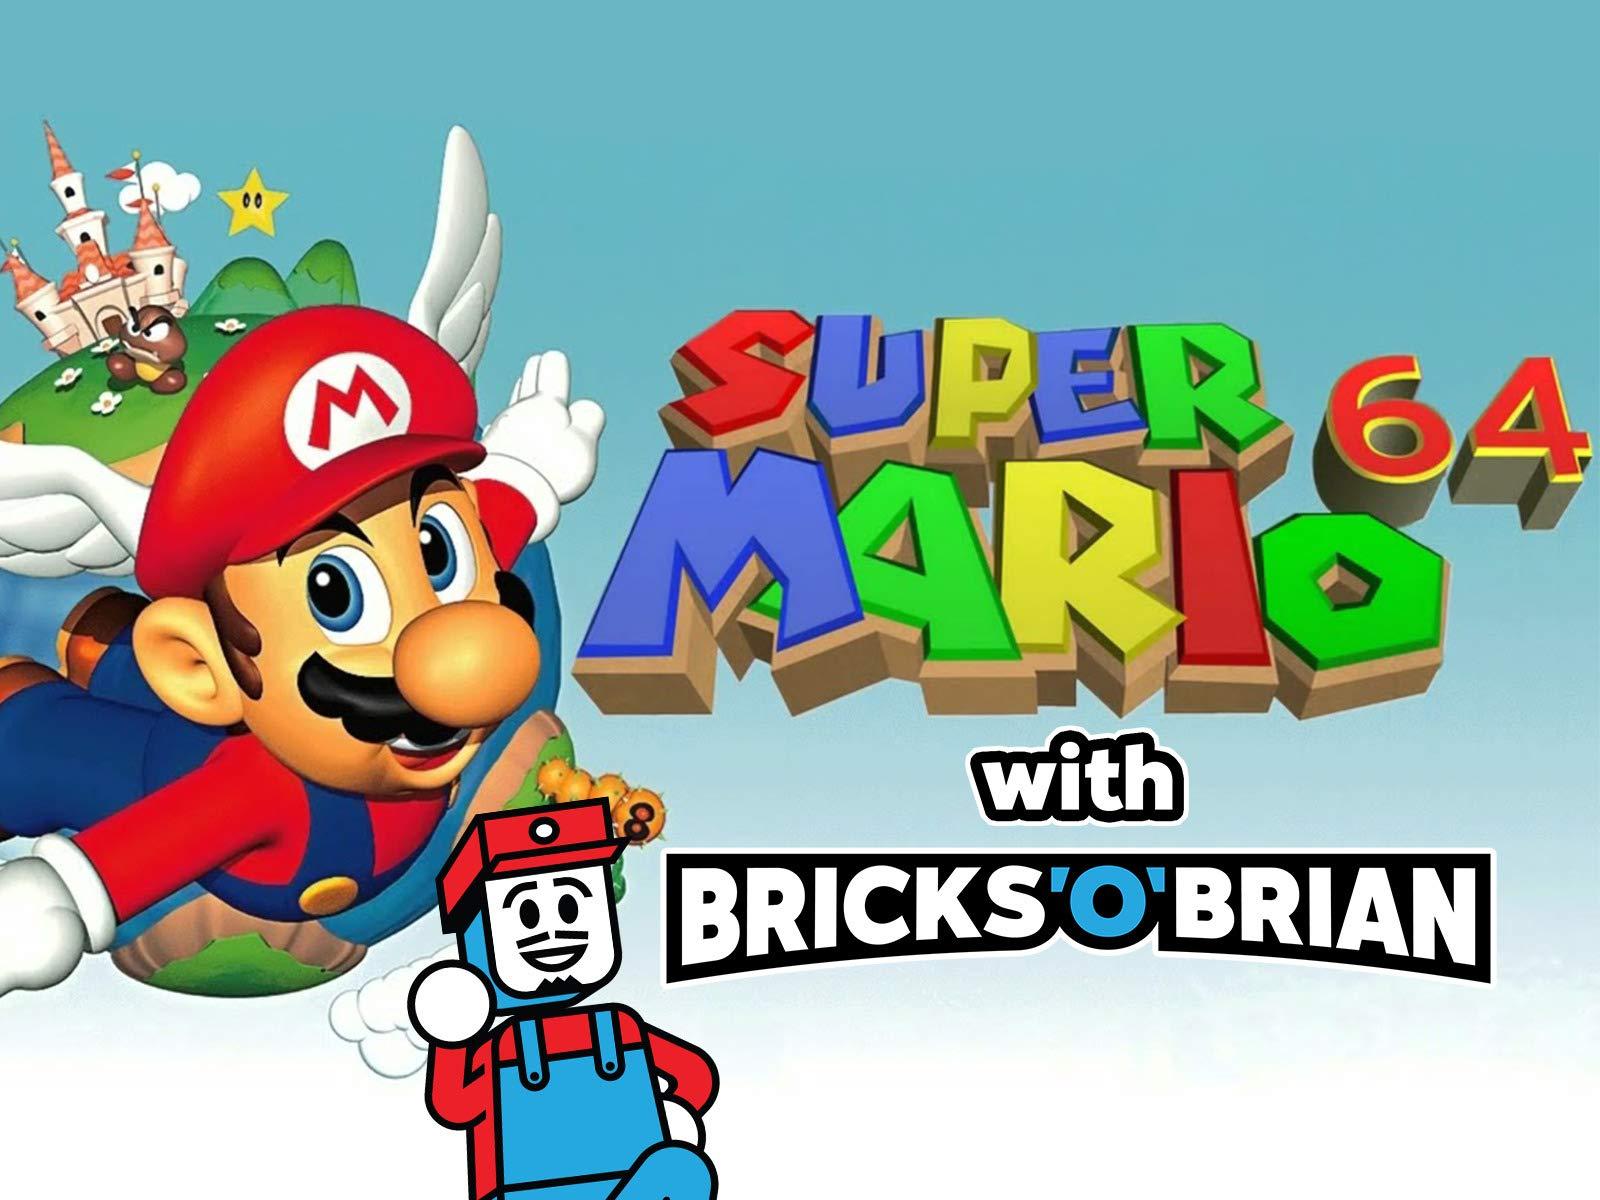 Clip: Super Mario 64 with Bricks 'O' Brian! - Season 1